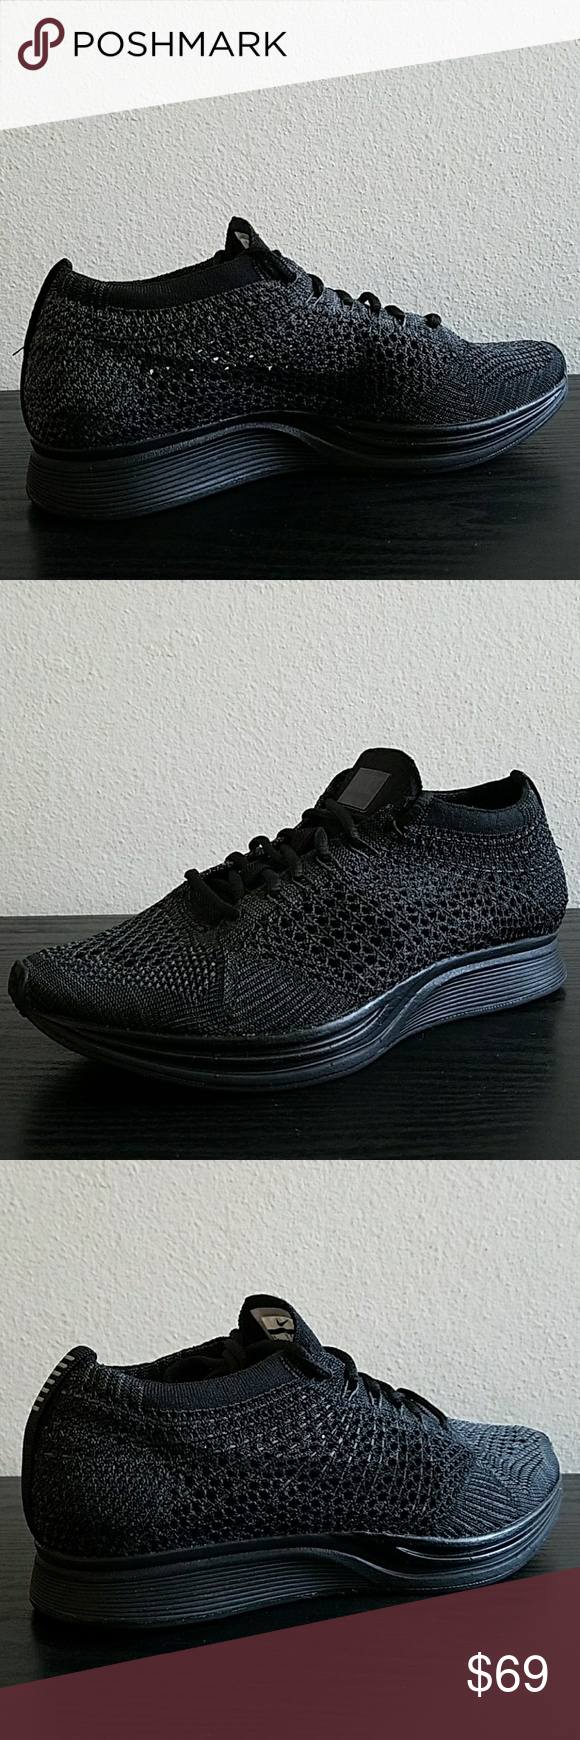 5969b30b86afd Nike Flyknit Racer Black Nike 526628 009 New Nike Air Flyknit Racer Unisex Running  Shoes Nike 526628 009 Color  Black Black-Black Size  Mens 5.5   Women s 7  ...